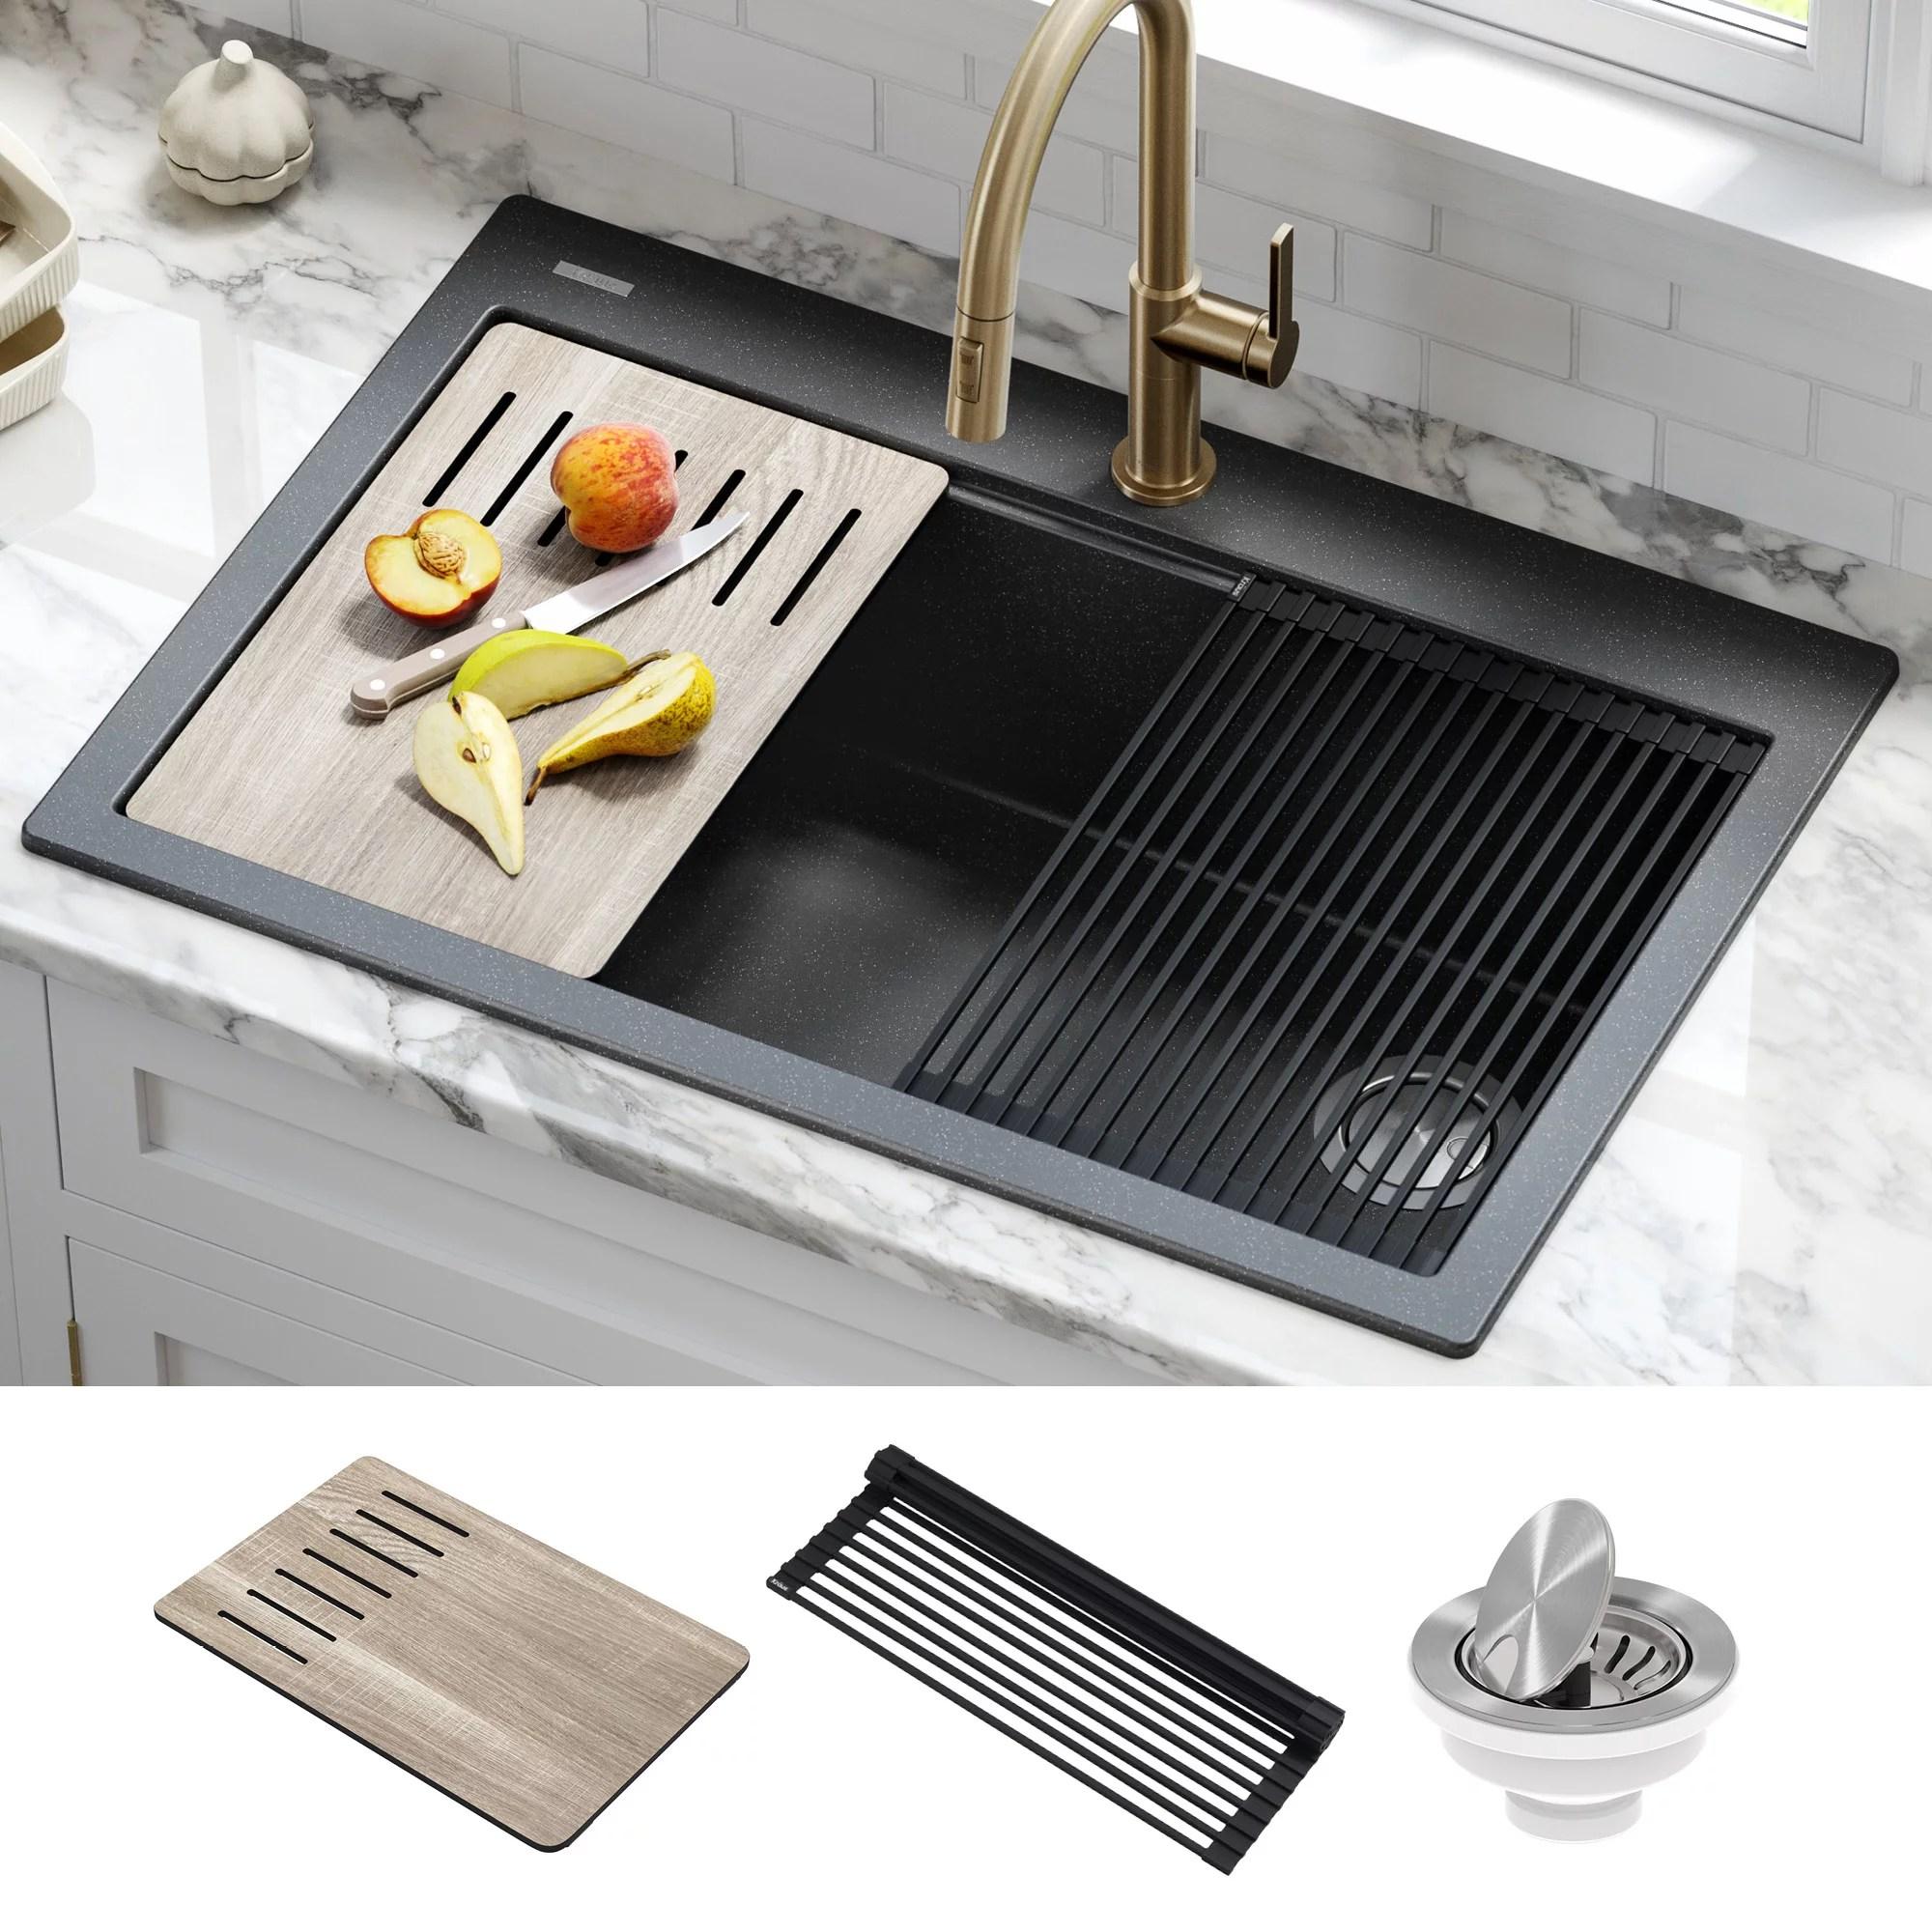 kraus bellucci workstation 33 inch drop in granite composite single bowl kitchen sink in metallic black with accessories walmart com